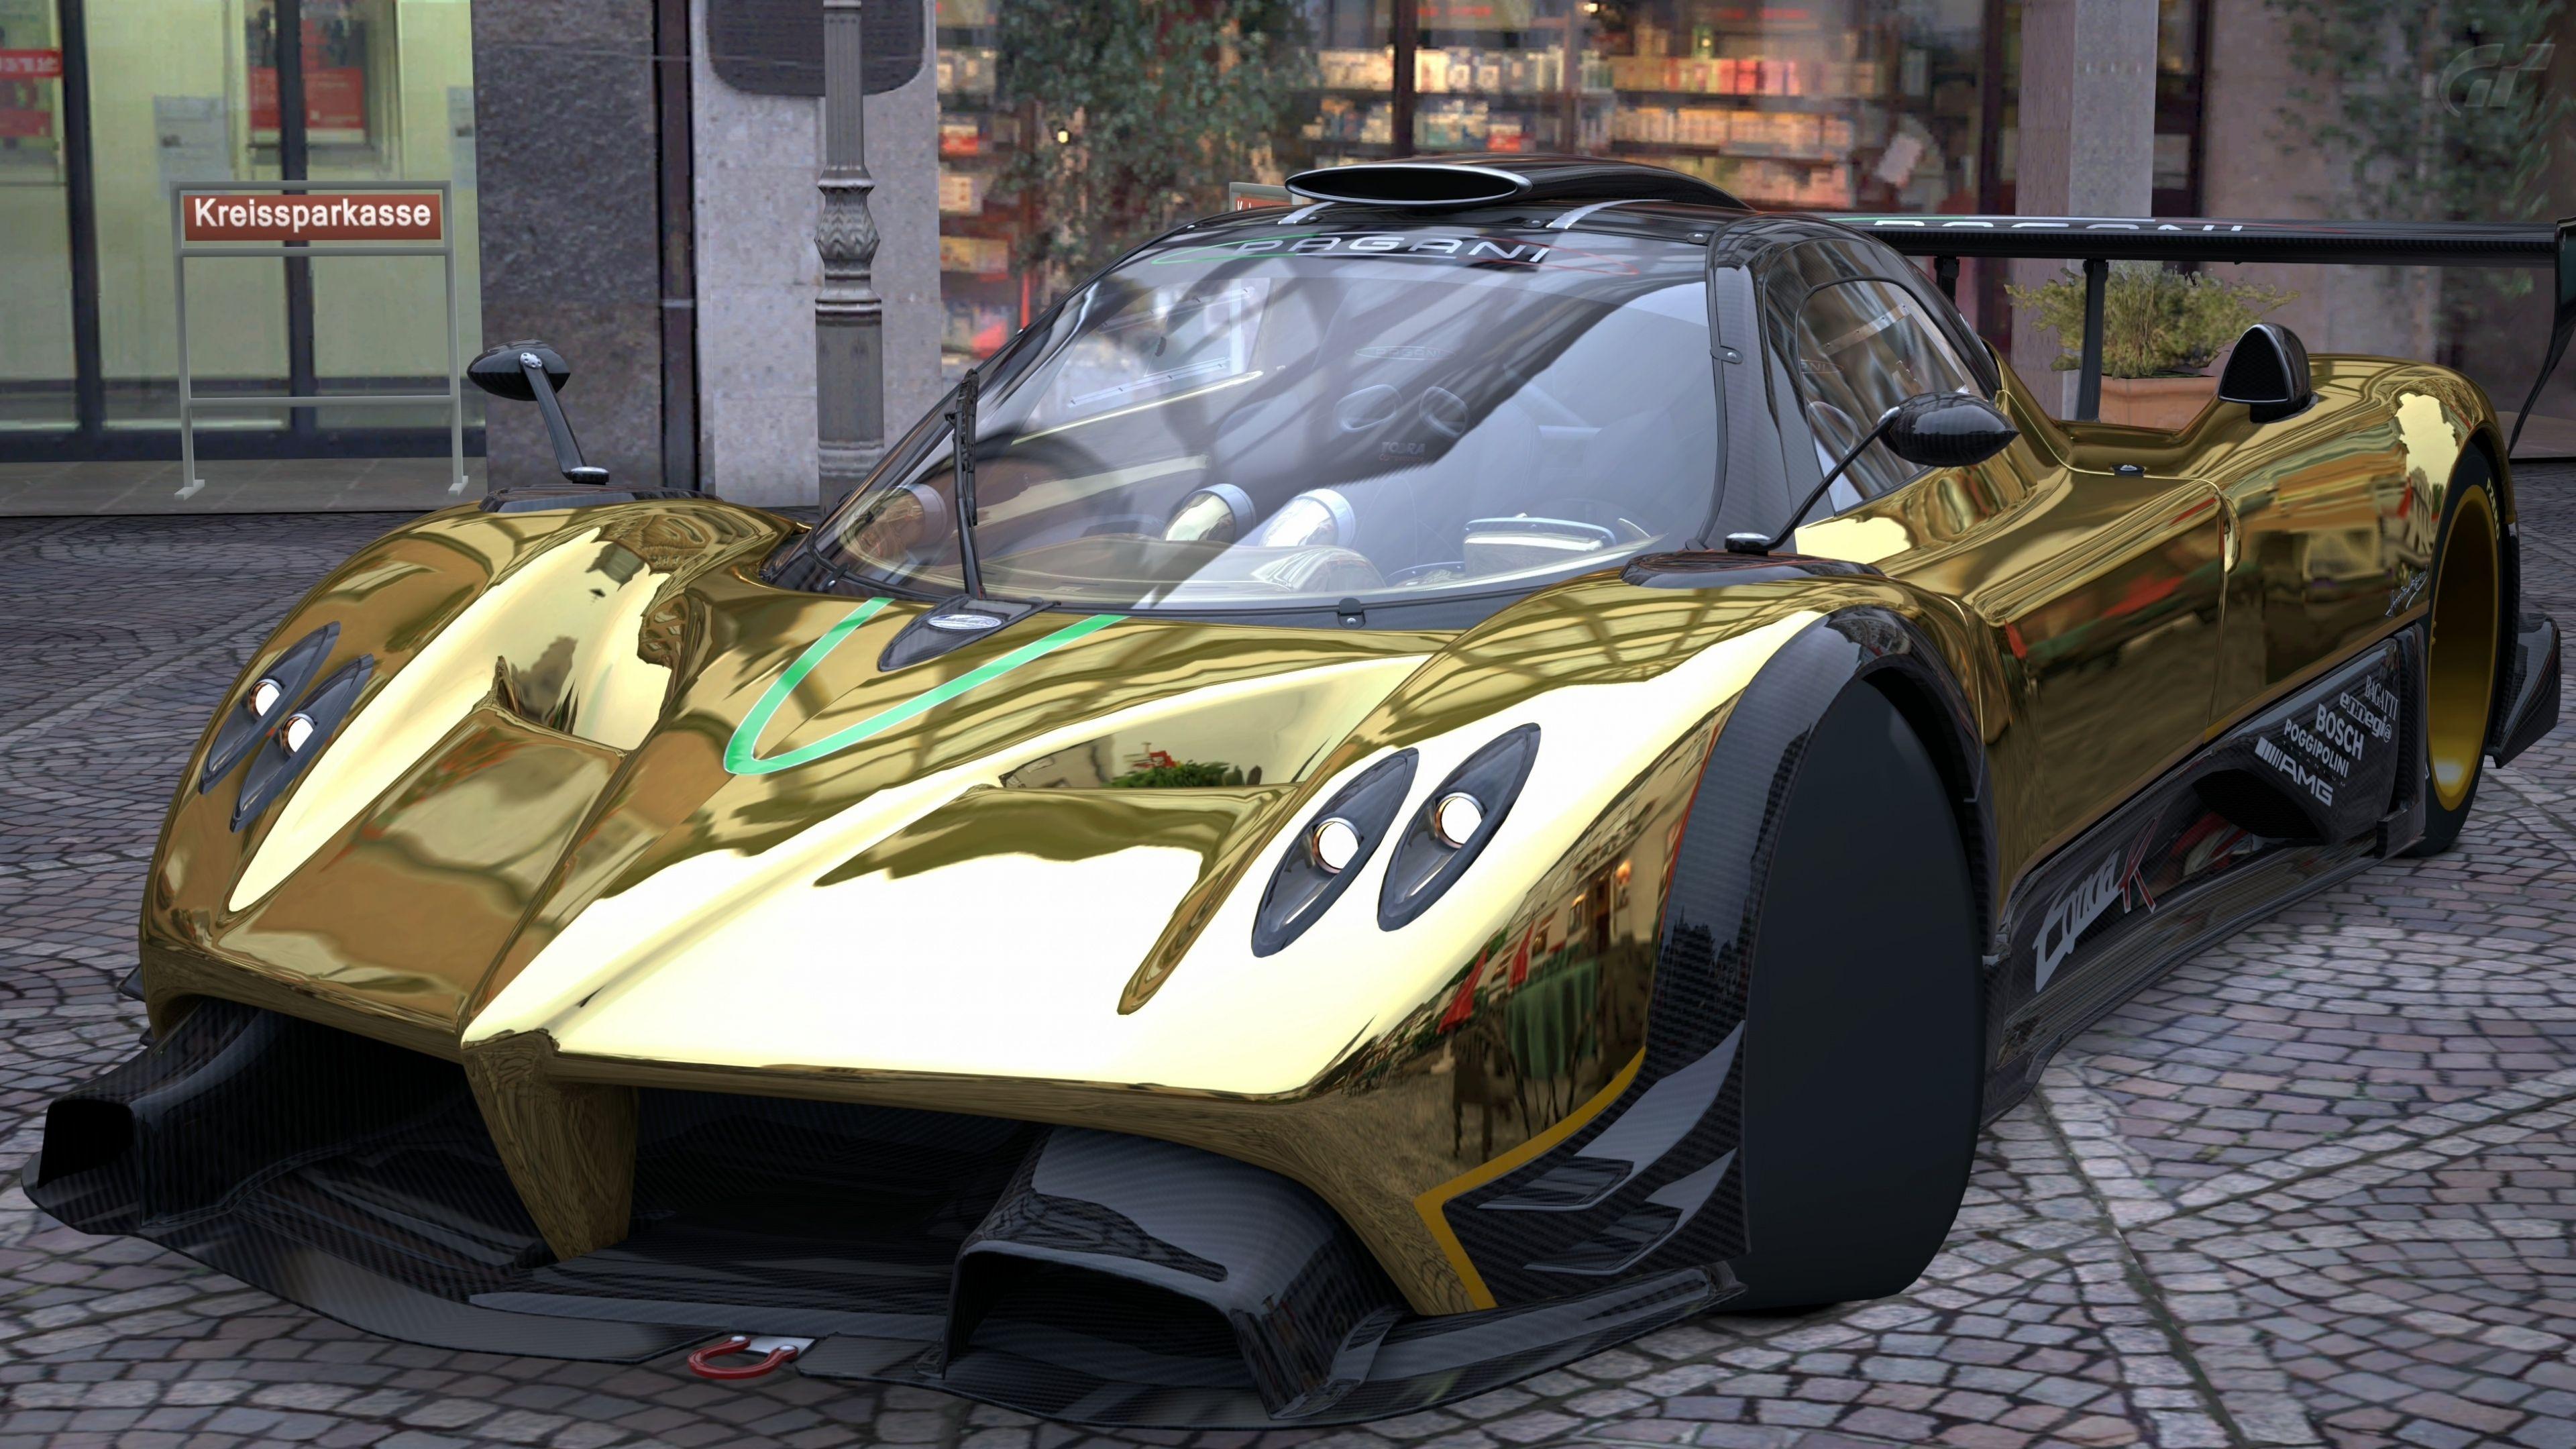 Pagani Zonda R Gold Wallpaper Carros Pinterest Cars Dream